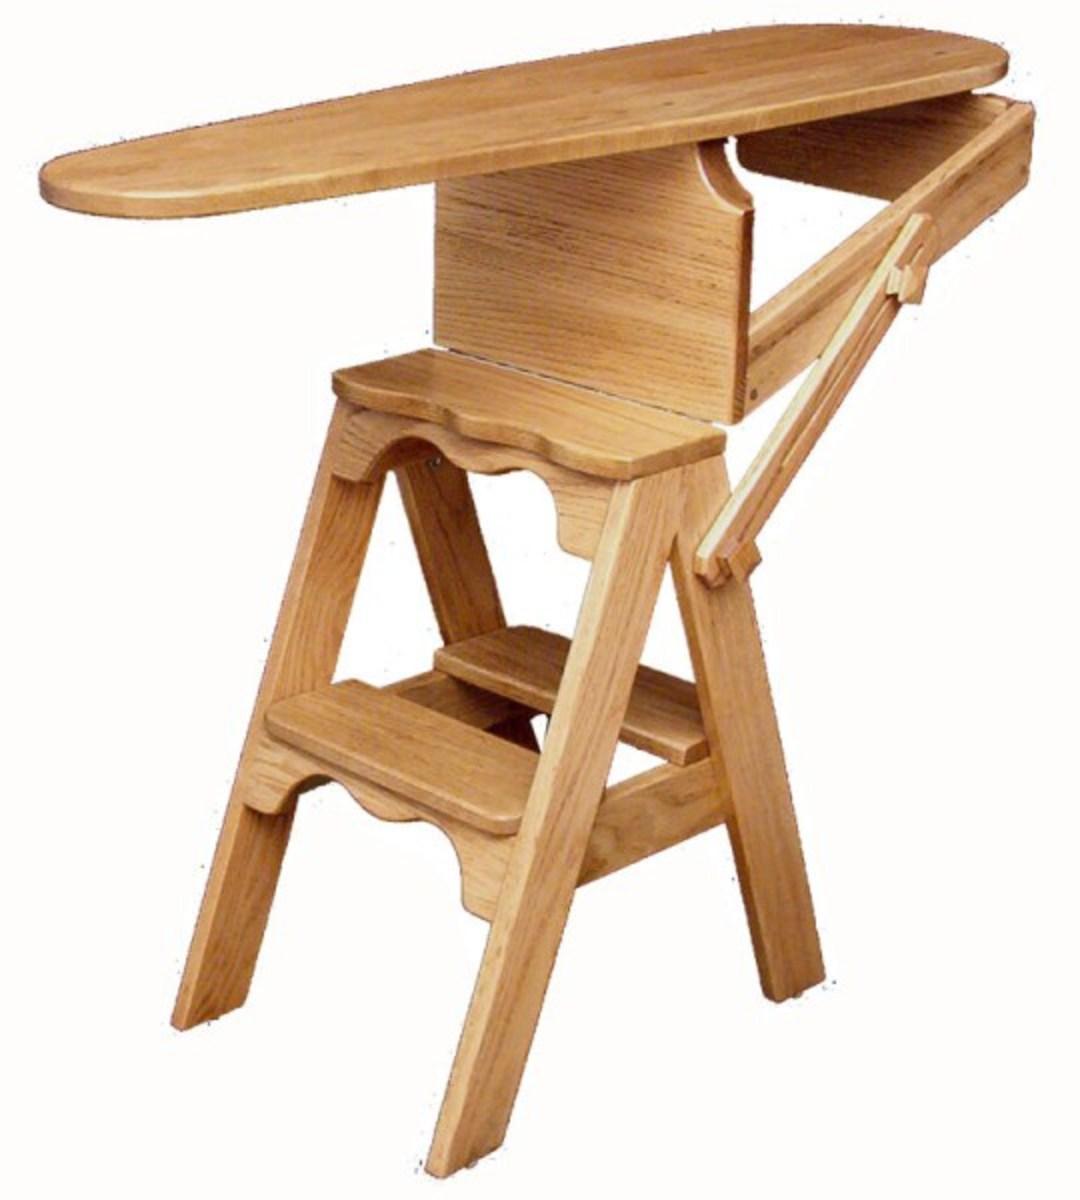 Jefferson Chair Plans PDF Woodworking